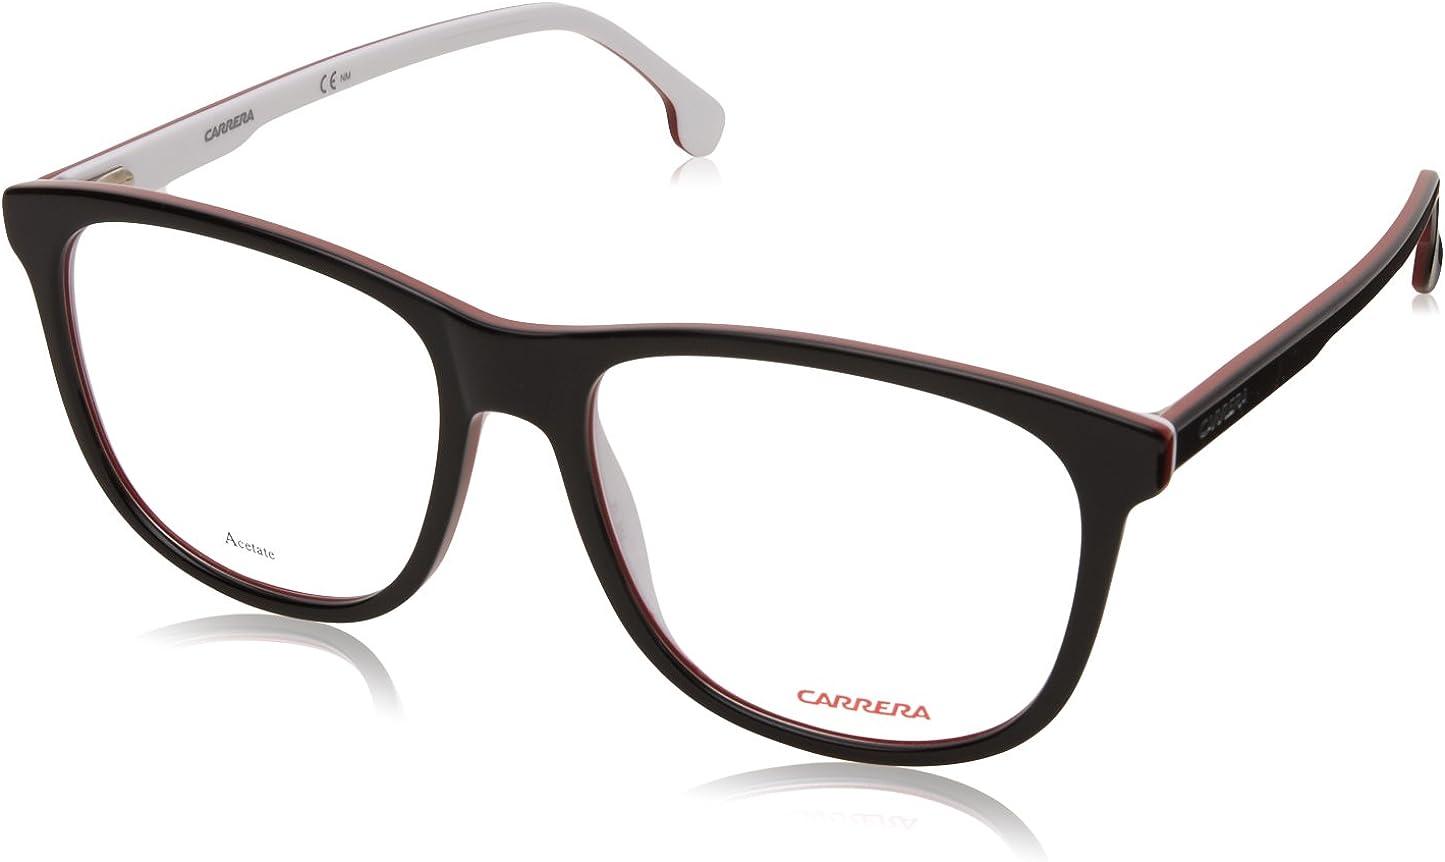 Lens Diameter 53mm Black Frame Distance Between Carrera 8818 Eyeglass Frames CA8818-0F3I-5317